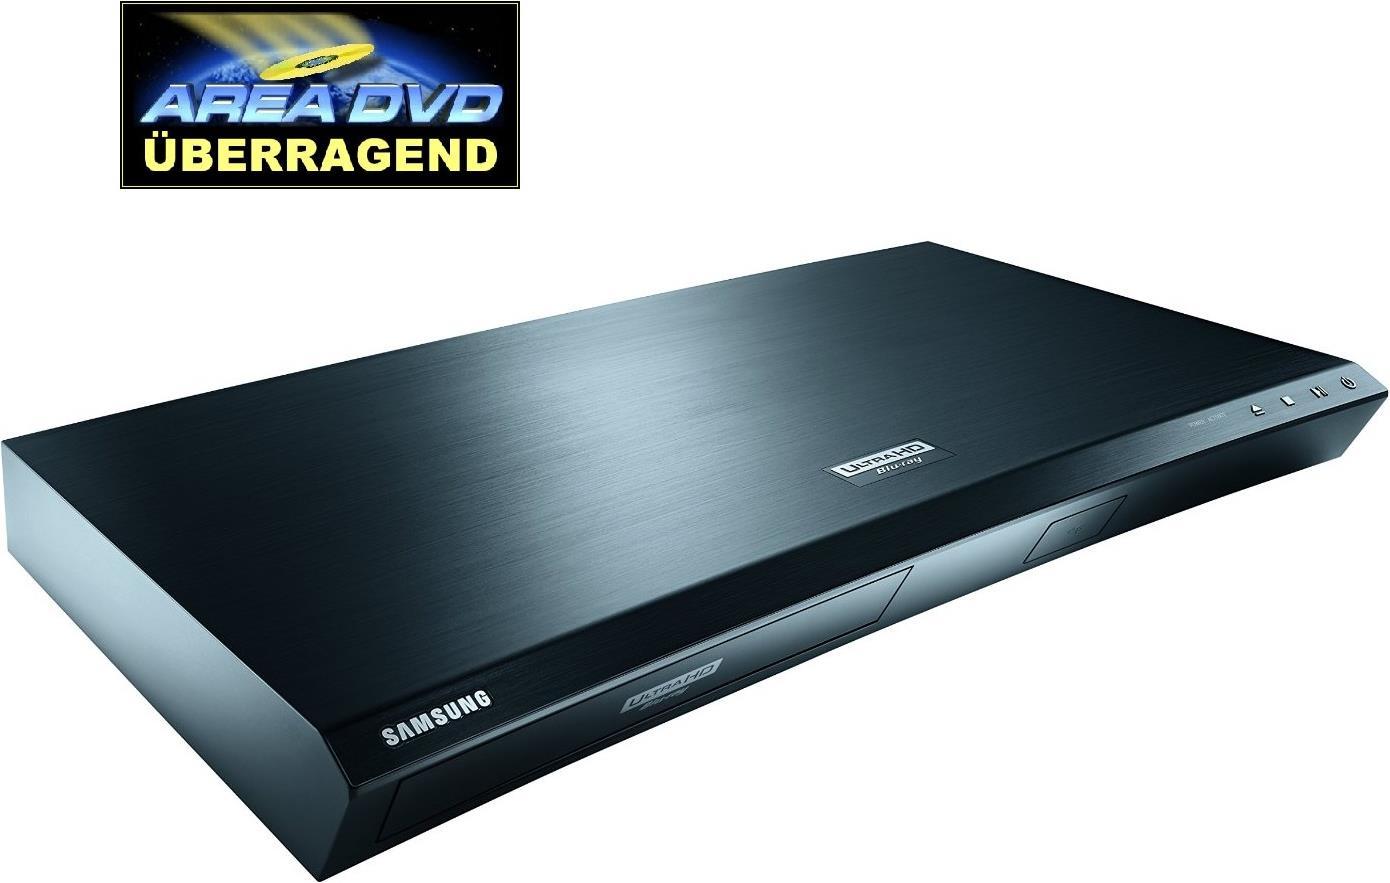 Schweiz: Samsung UBD-K8500 für 199 CHF inkl VSK @Digitec.ch - 4K 3D Blu-ray Player